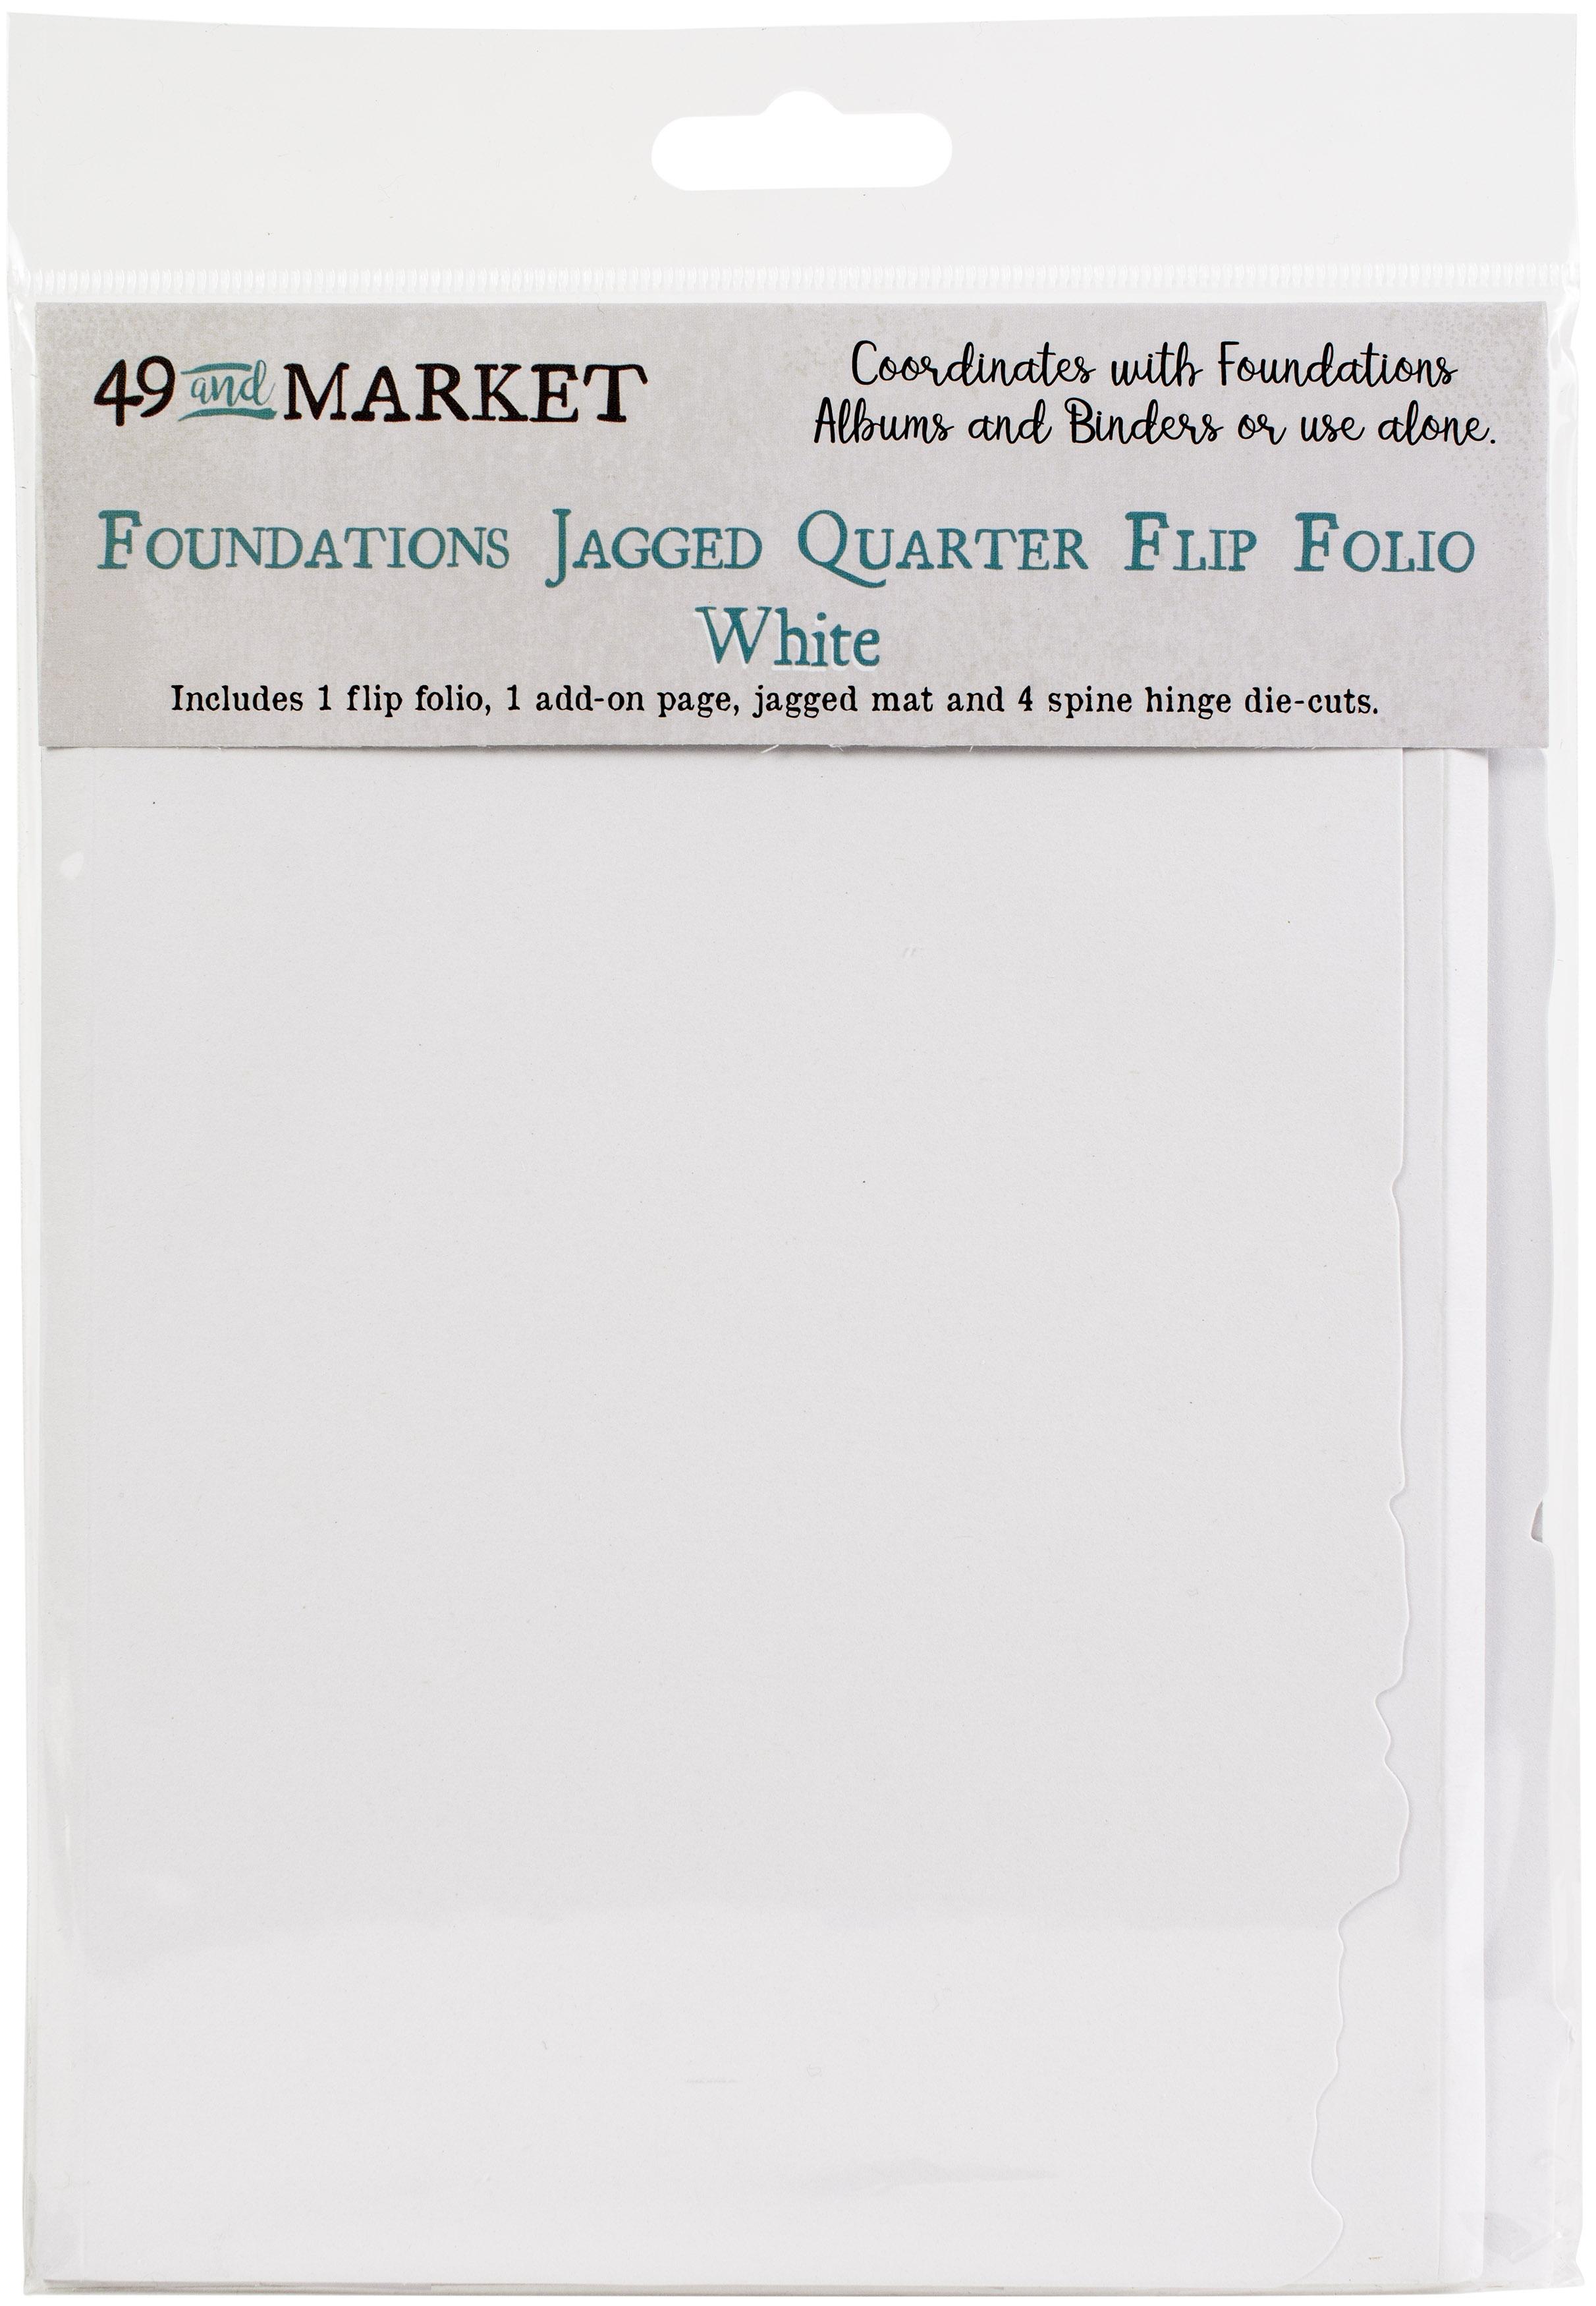 49 And Market Foundations Jagged Quarter Flip Folio-White